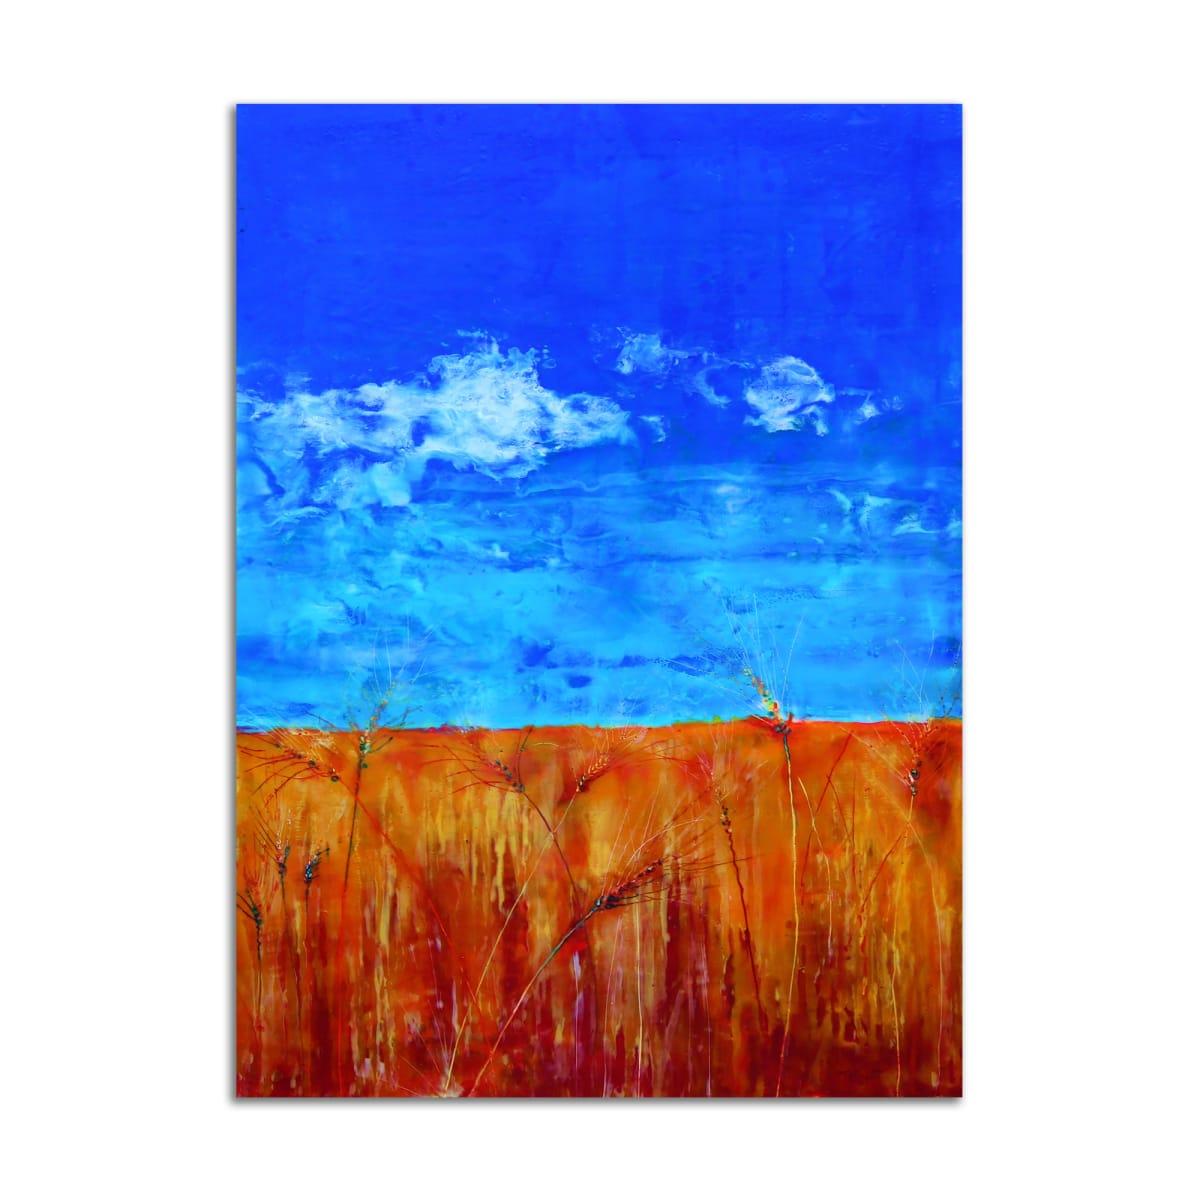 Amber Waves of Grain by T.D. Scott